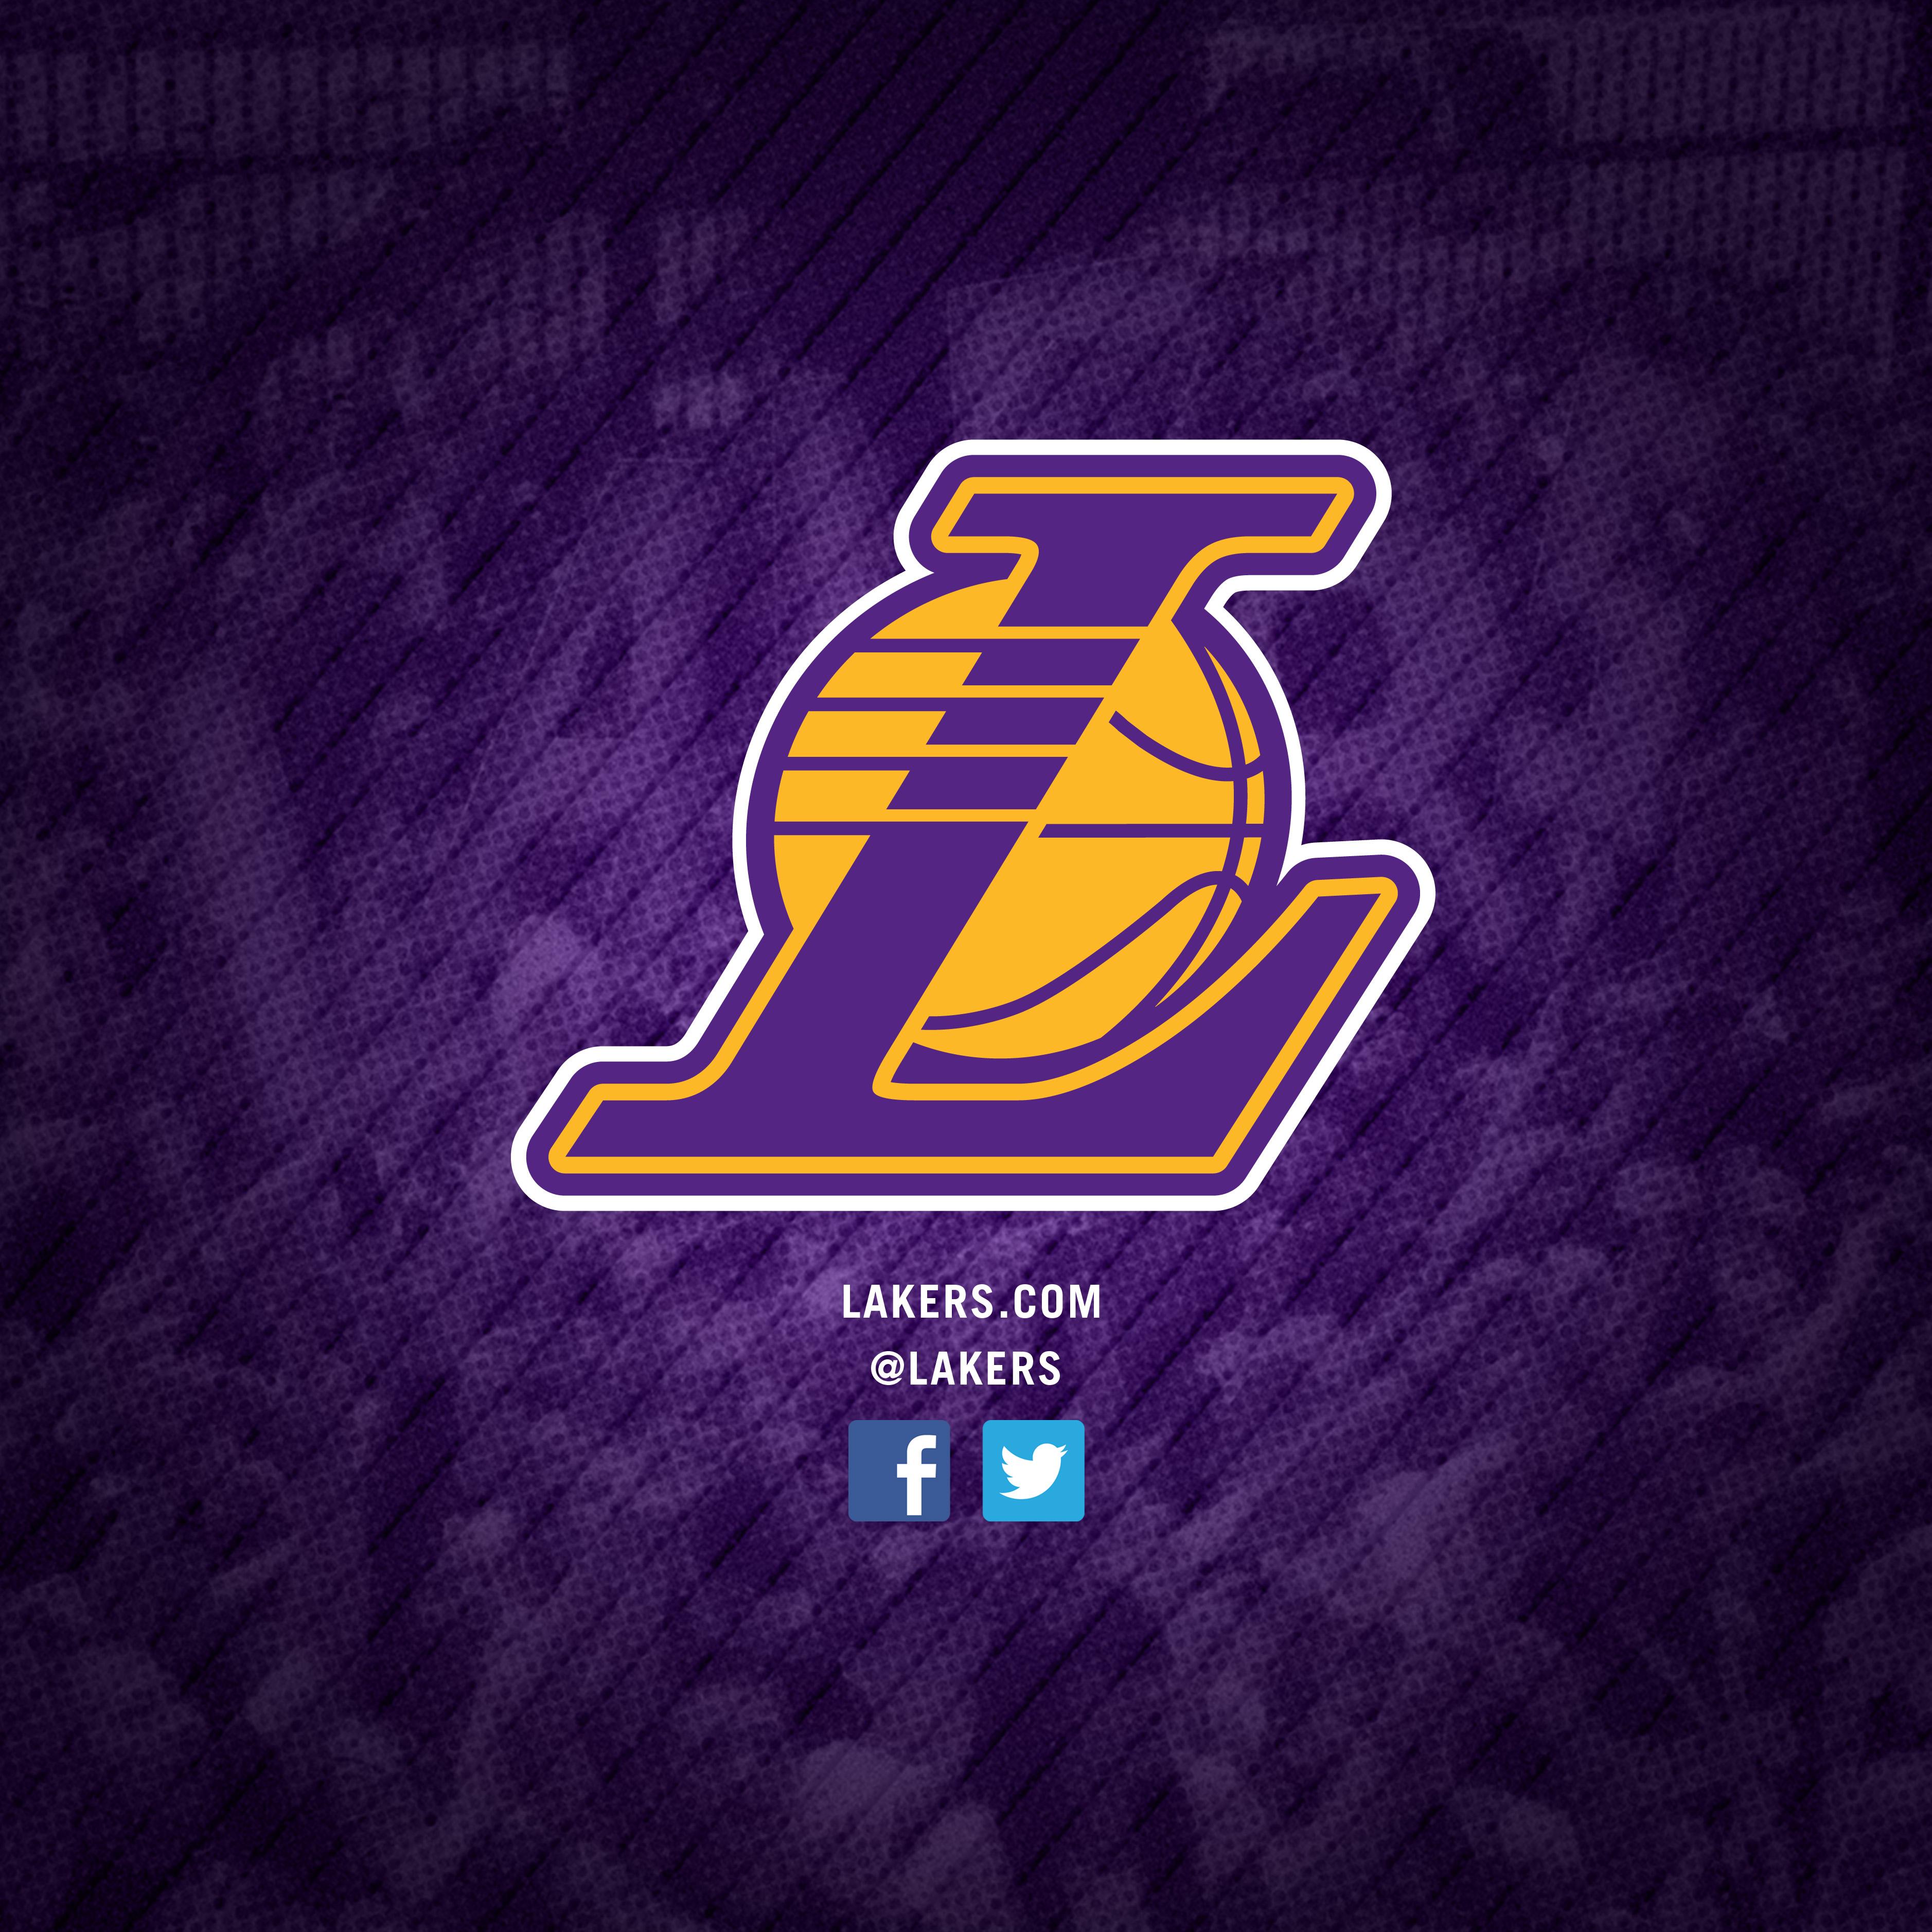 Wallpaper Los Angeles: Lakers Logo Wallpaper